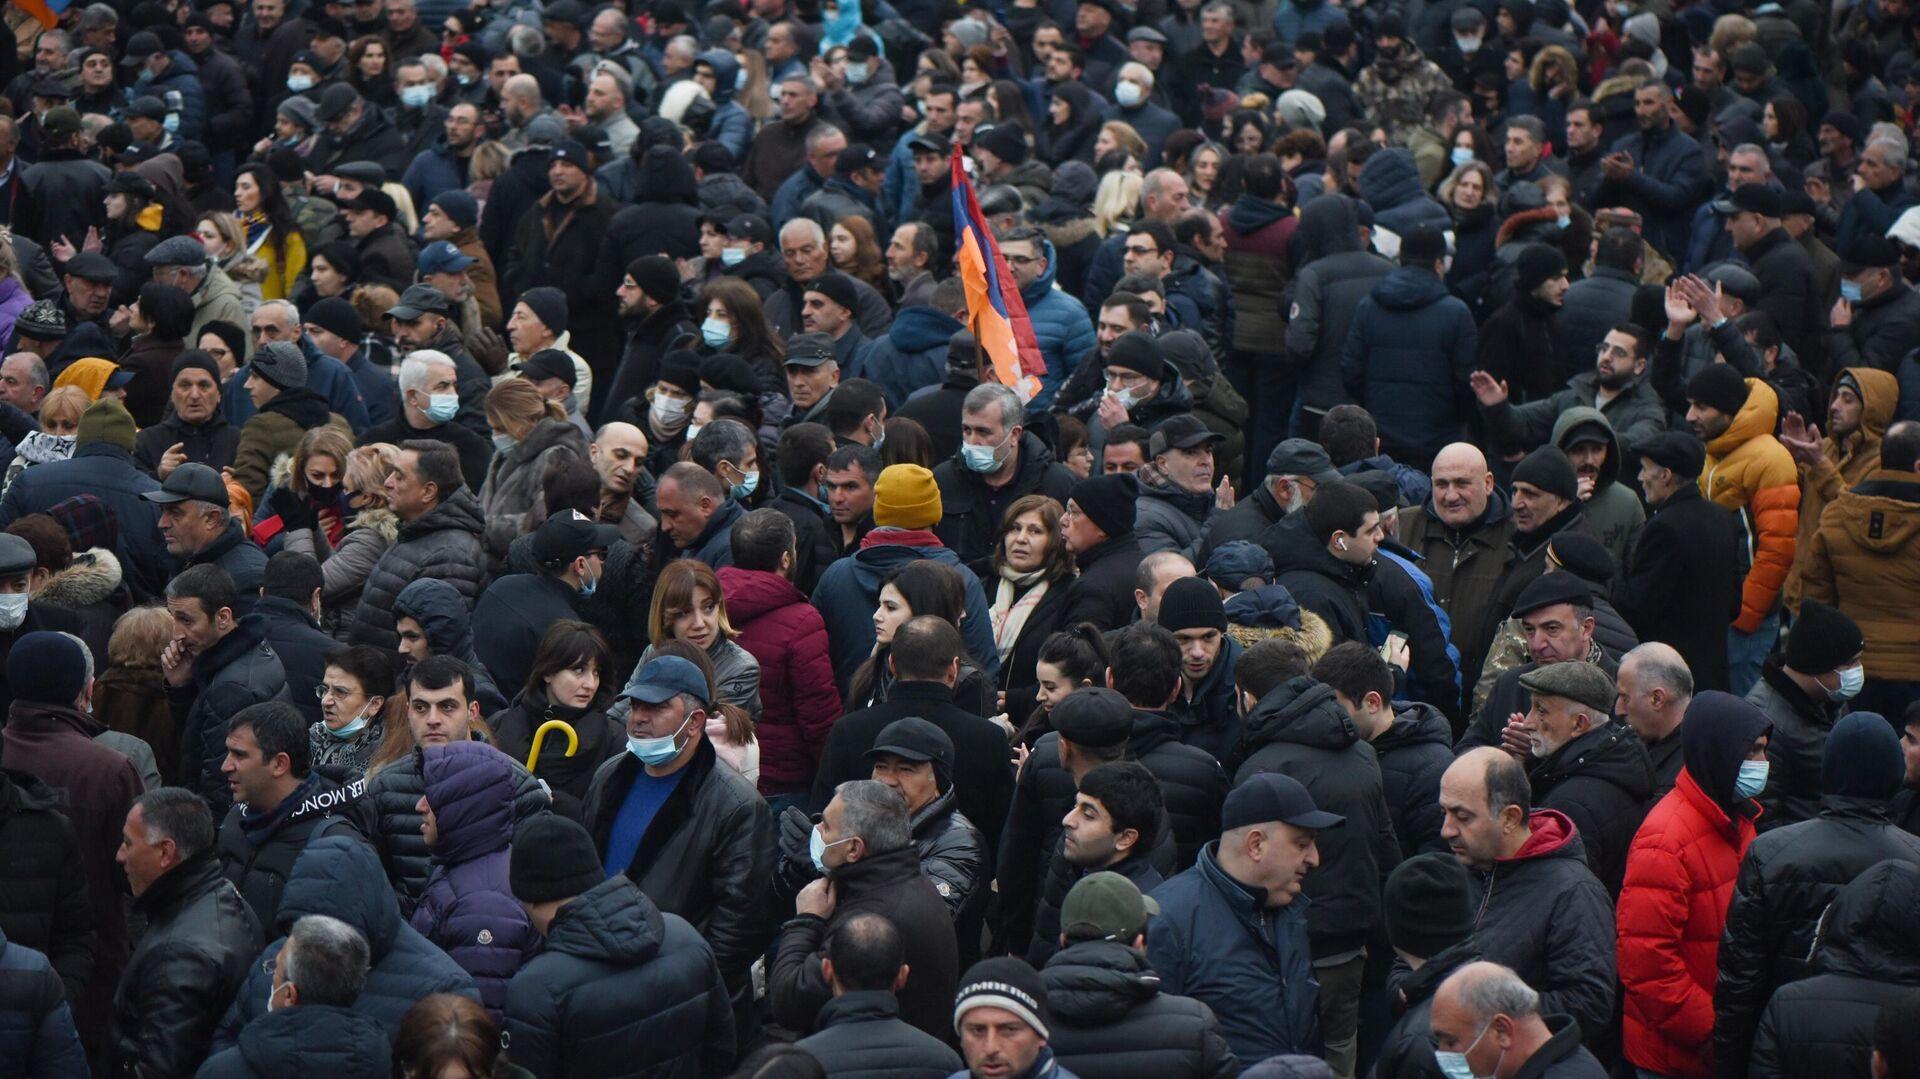 Участники акции протеста оппозиции с требованием отставки премьер-министра Армении Никола Пашиняна на проспекте Баграмяна в Ереване - РИА Новости, 1920, 03.03.2021